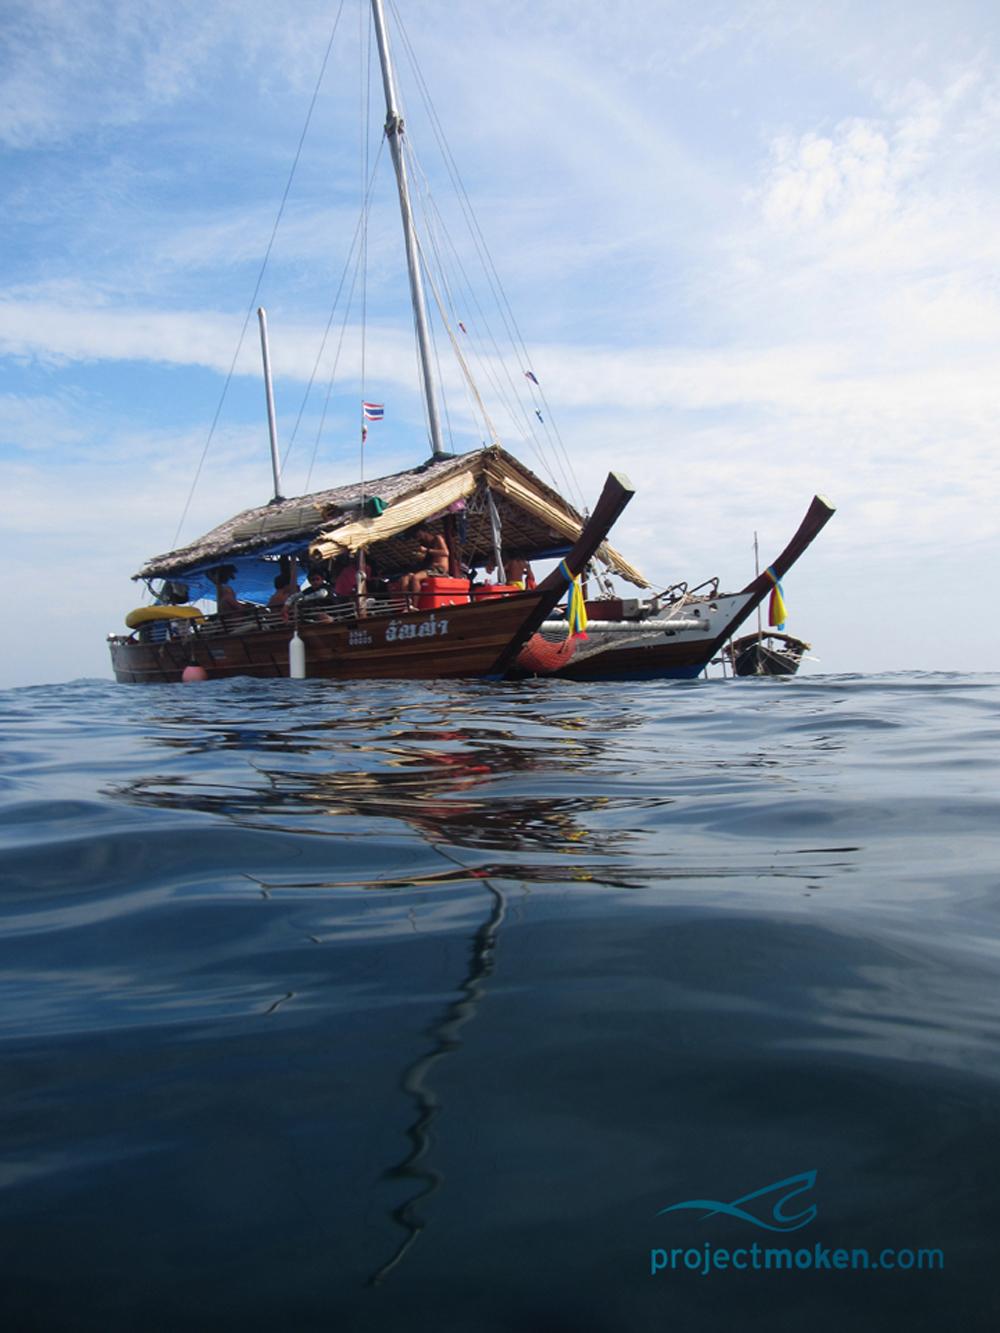 Project Moken - Vanya Catamaran